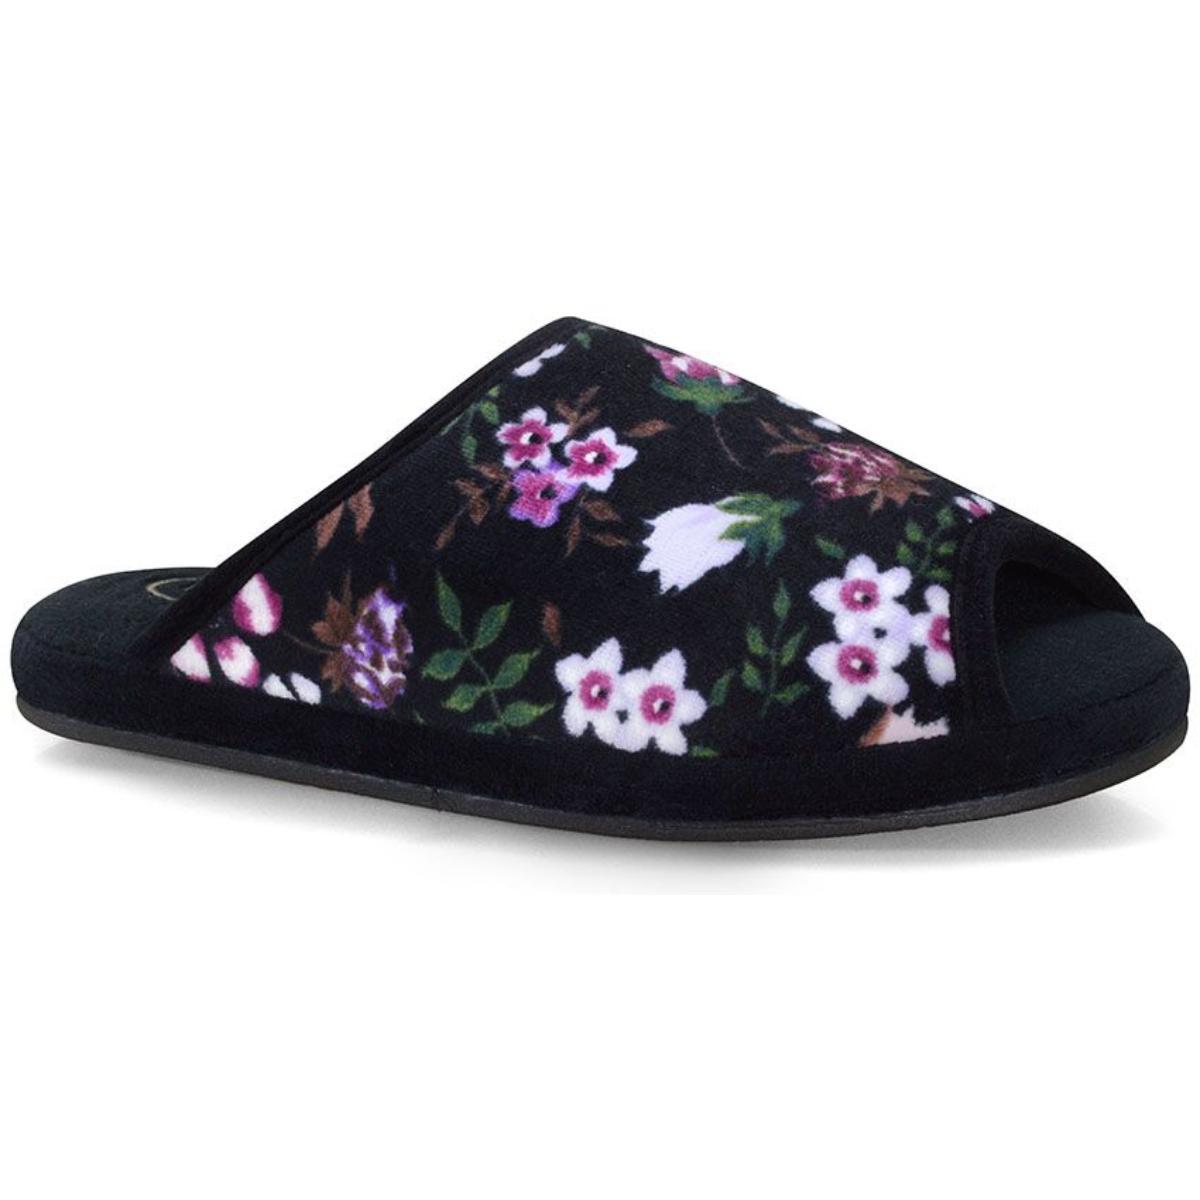 Chinelo Feminino Leffa 456 Floral Orquidea